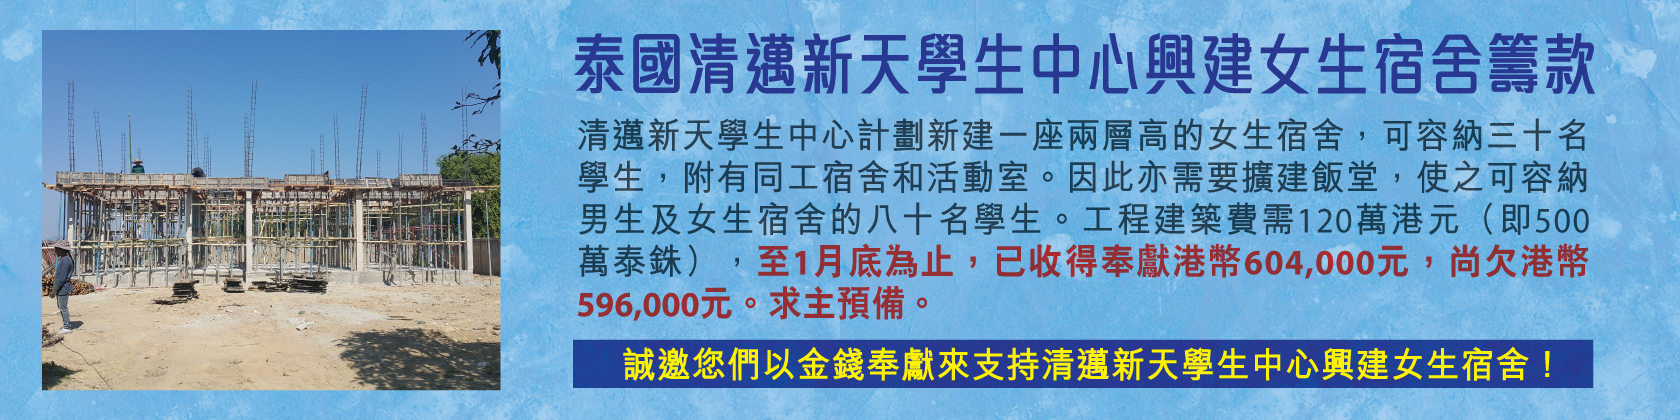 CB-02-web-banner-1680-x-420-017